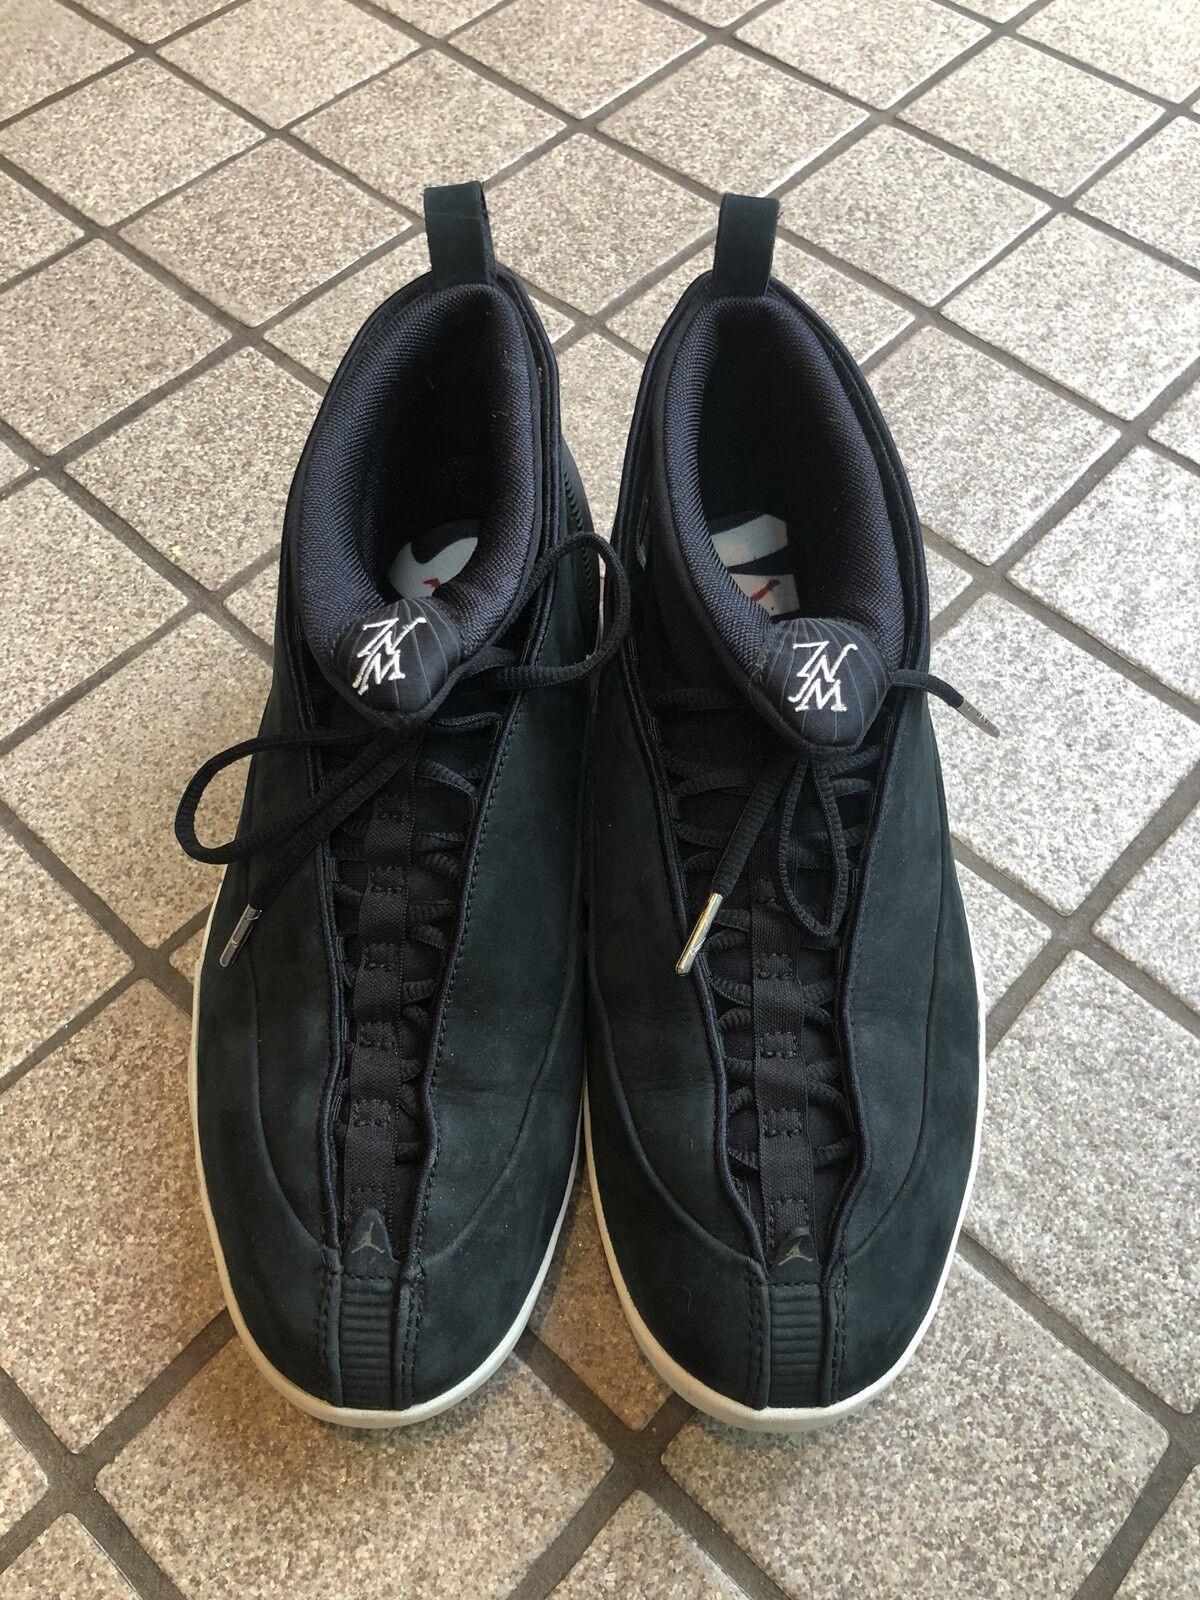 Nike Air Jordan Retro 15 PSNY Comfortable Cheap women's shoes women's shoes